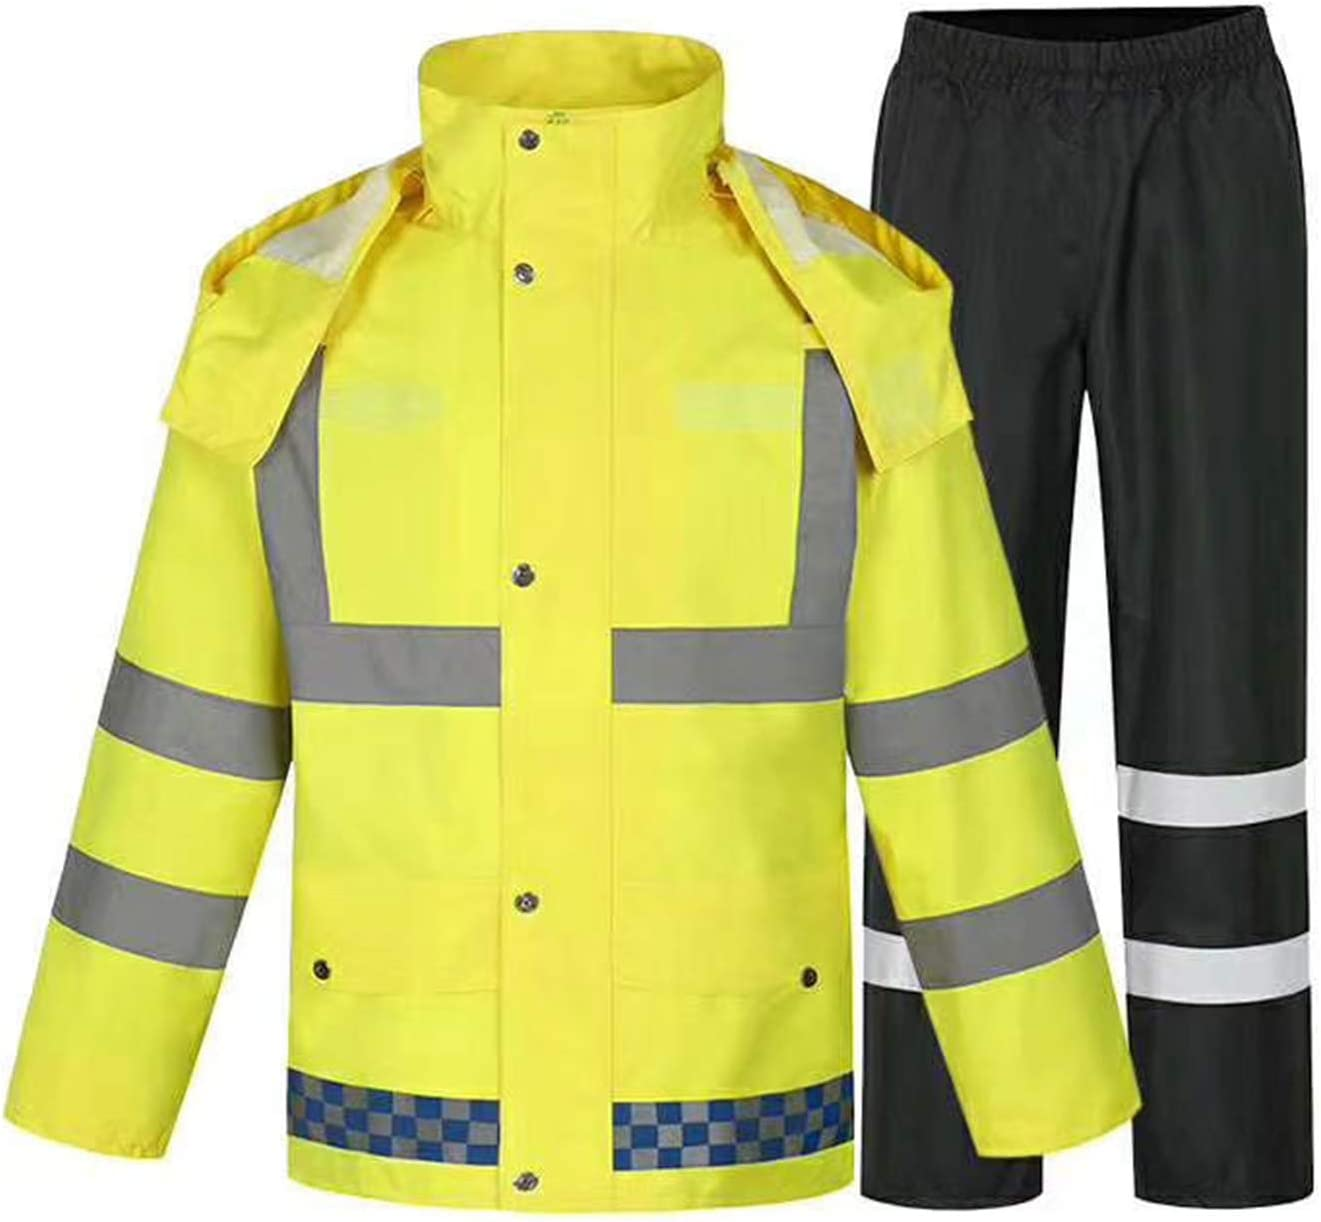 Large discharge sale ZOJO High Visibility Safety Rain Pants Visibi suit Luxury goods Jacket